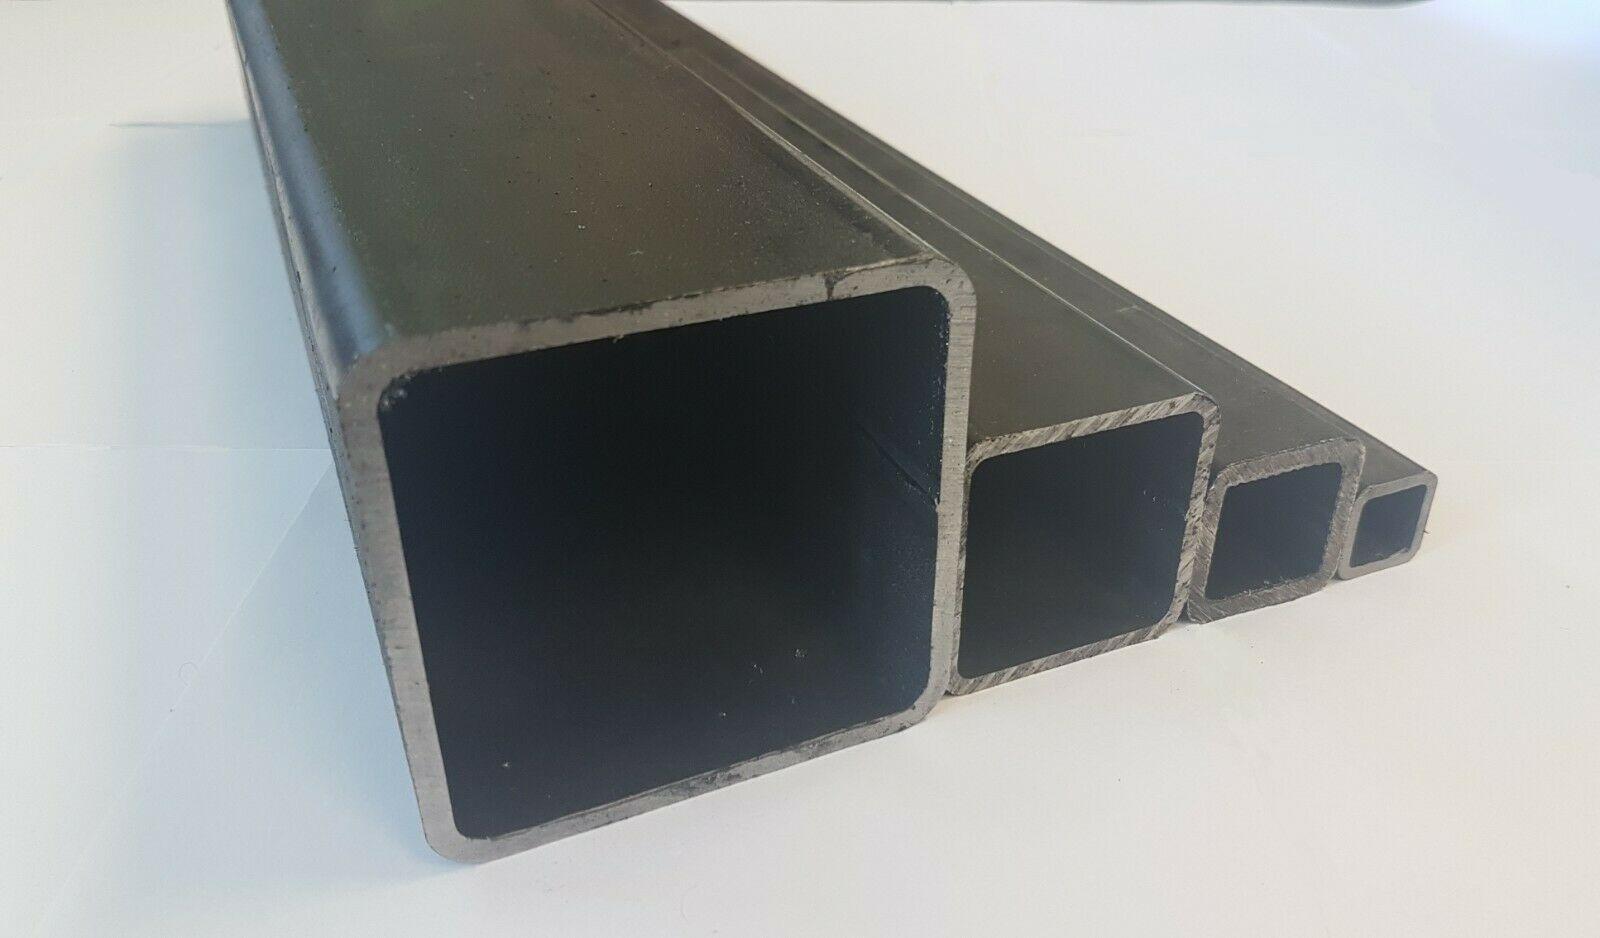 EN 10305-5 L= 500-2000mm 2000mm E235-60x30x3mm Rechteckrohr Stahlrohr Vierkantrohr